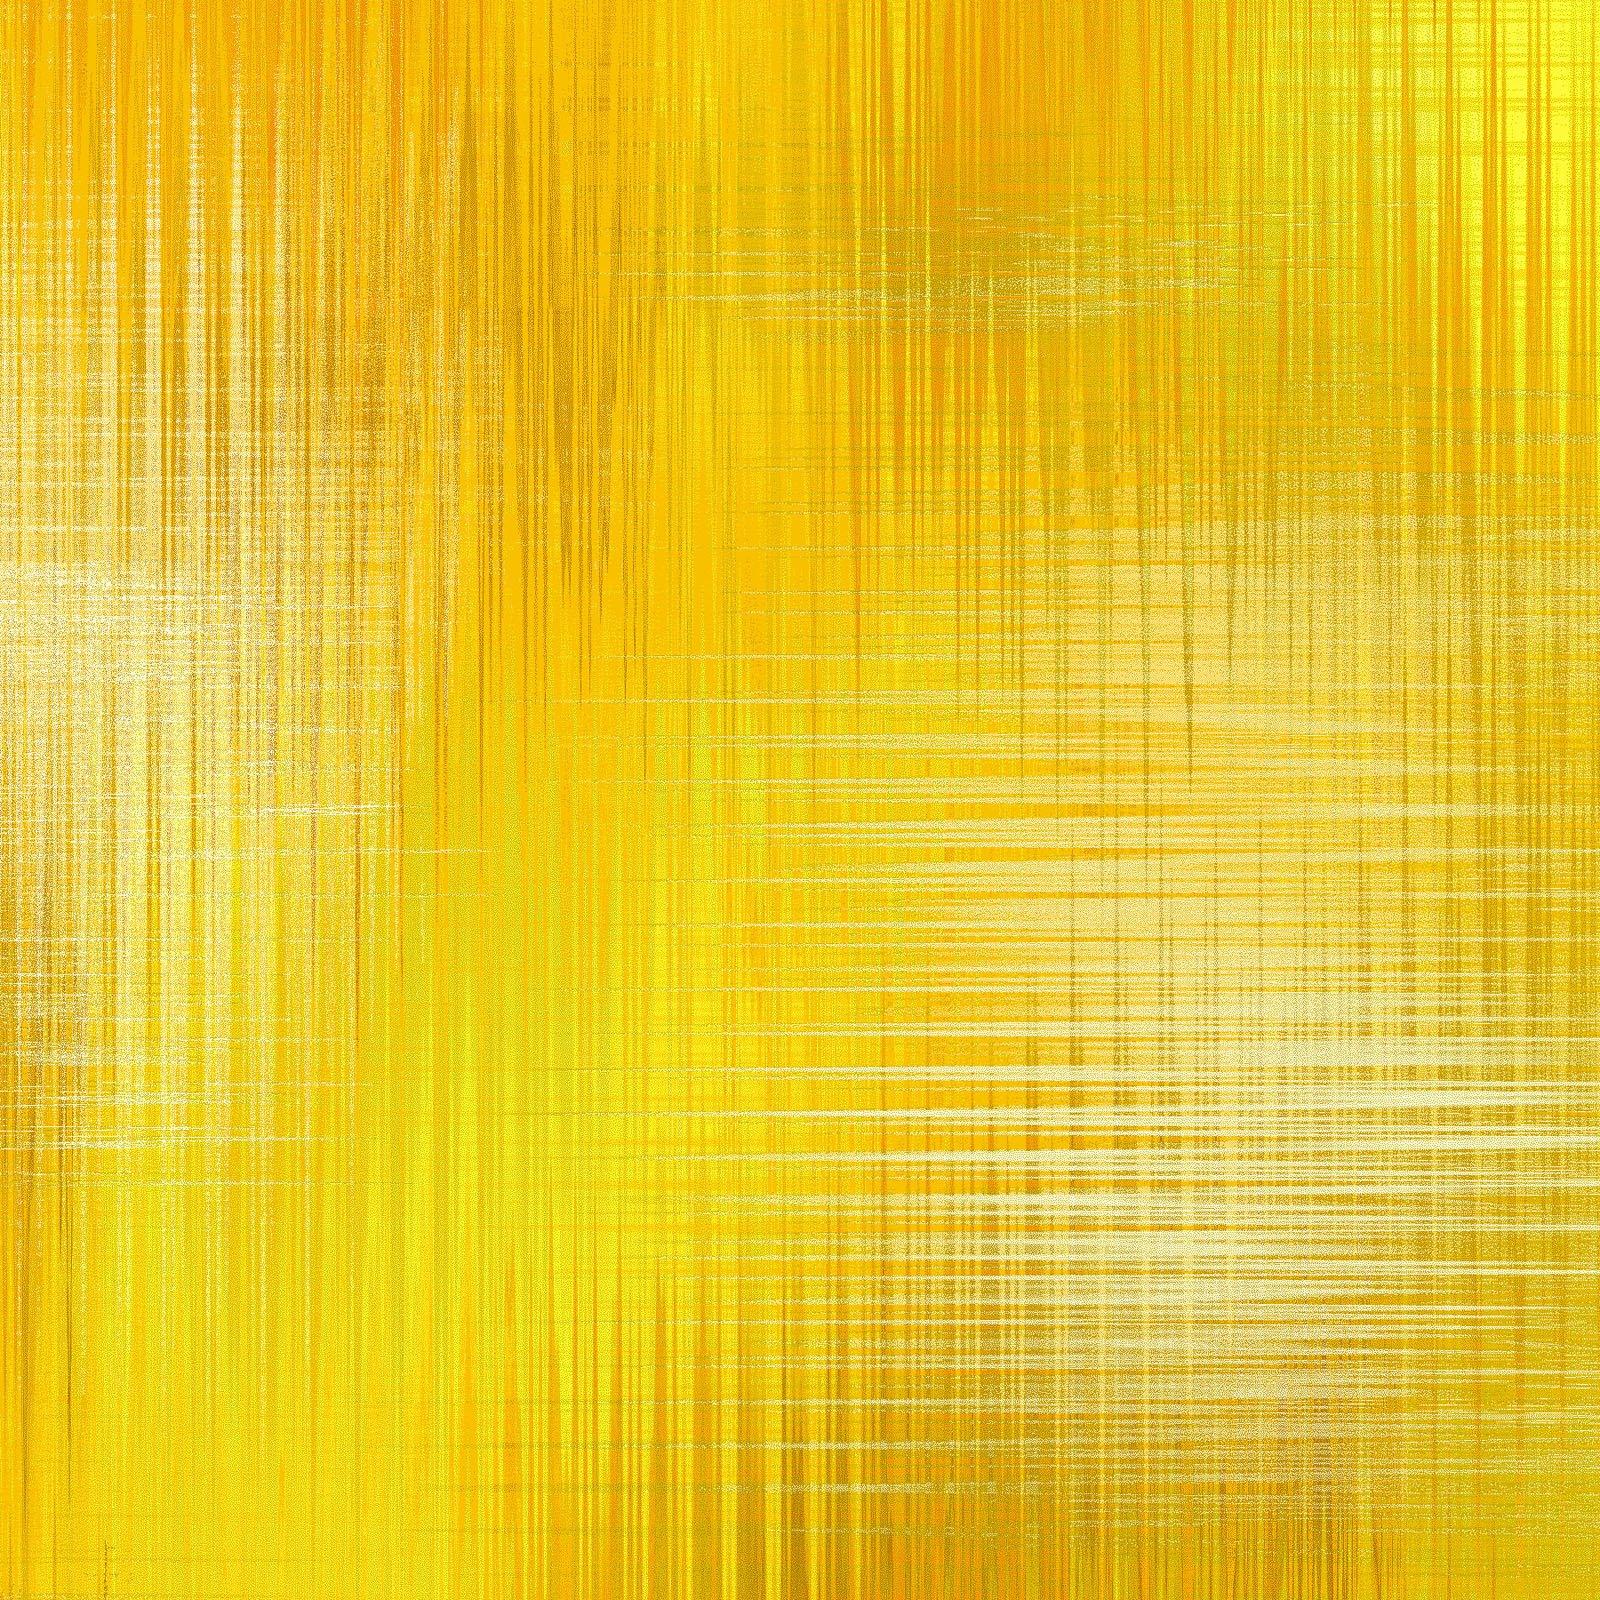 Crosshatch - Yellow<br/>Studio-e 3915-33